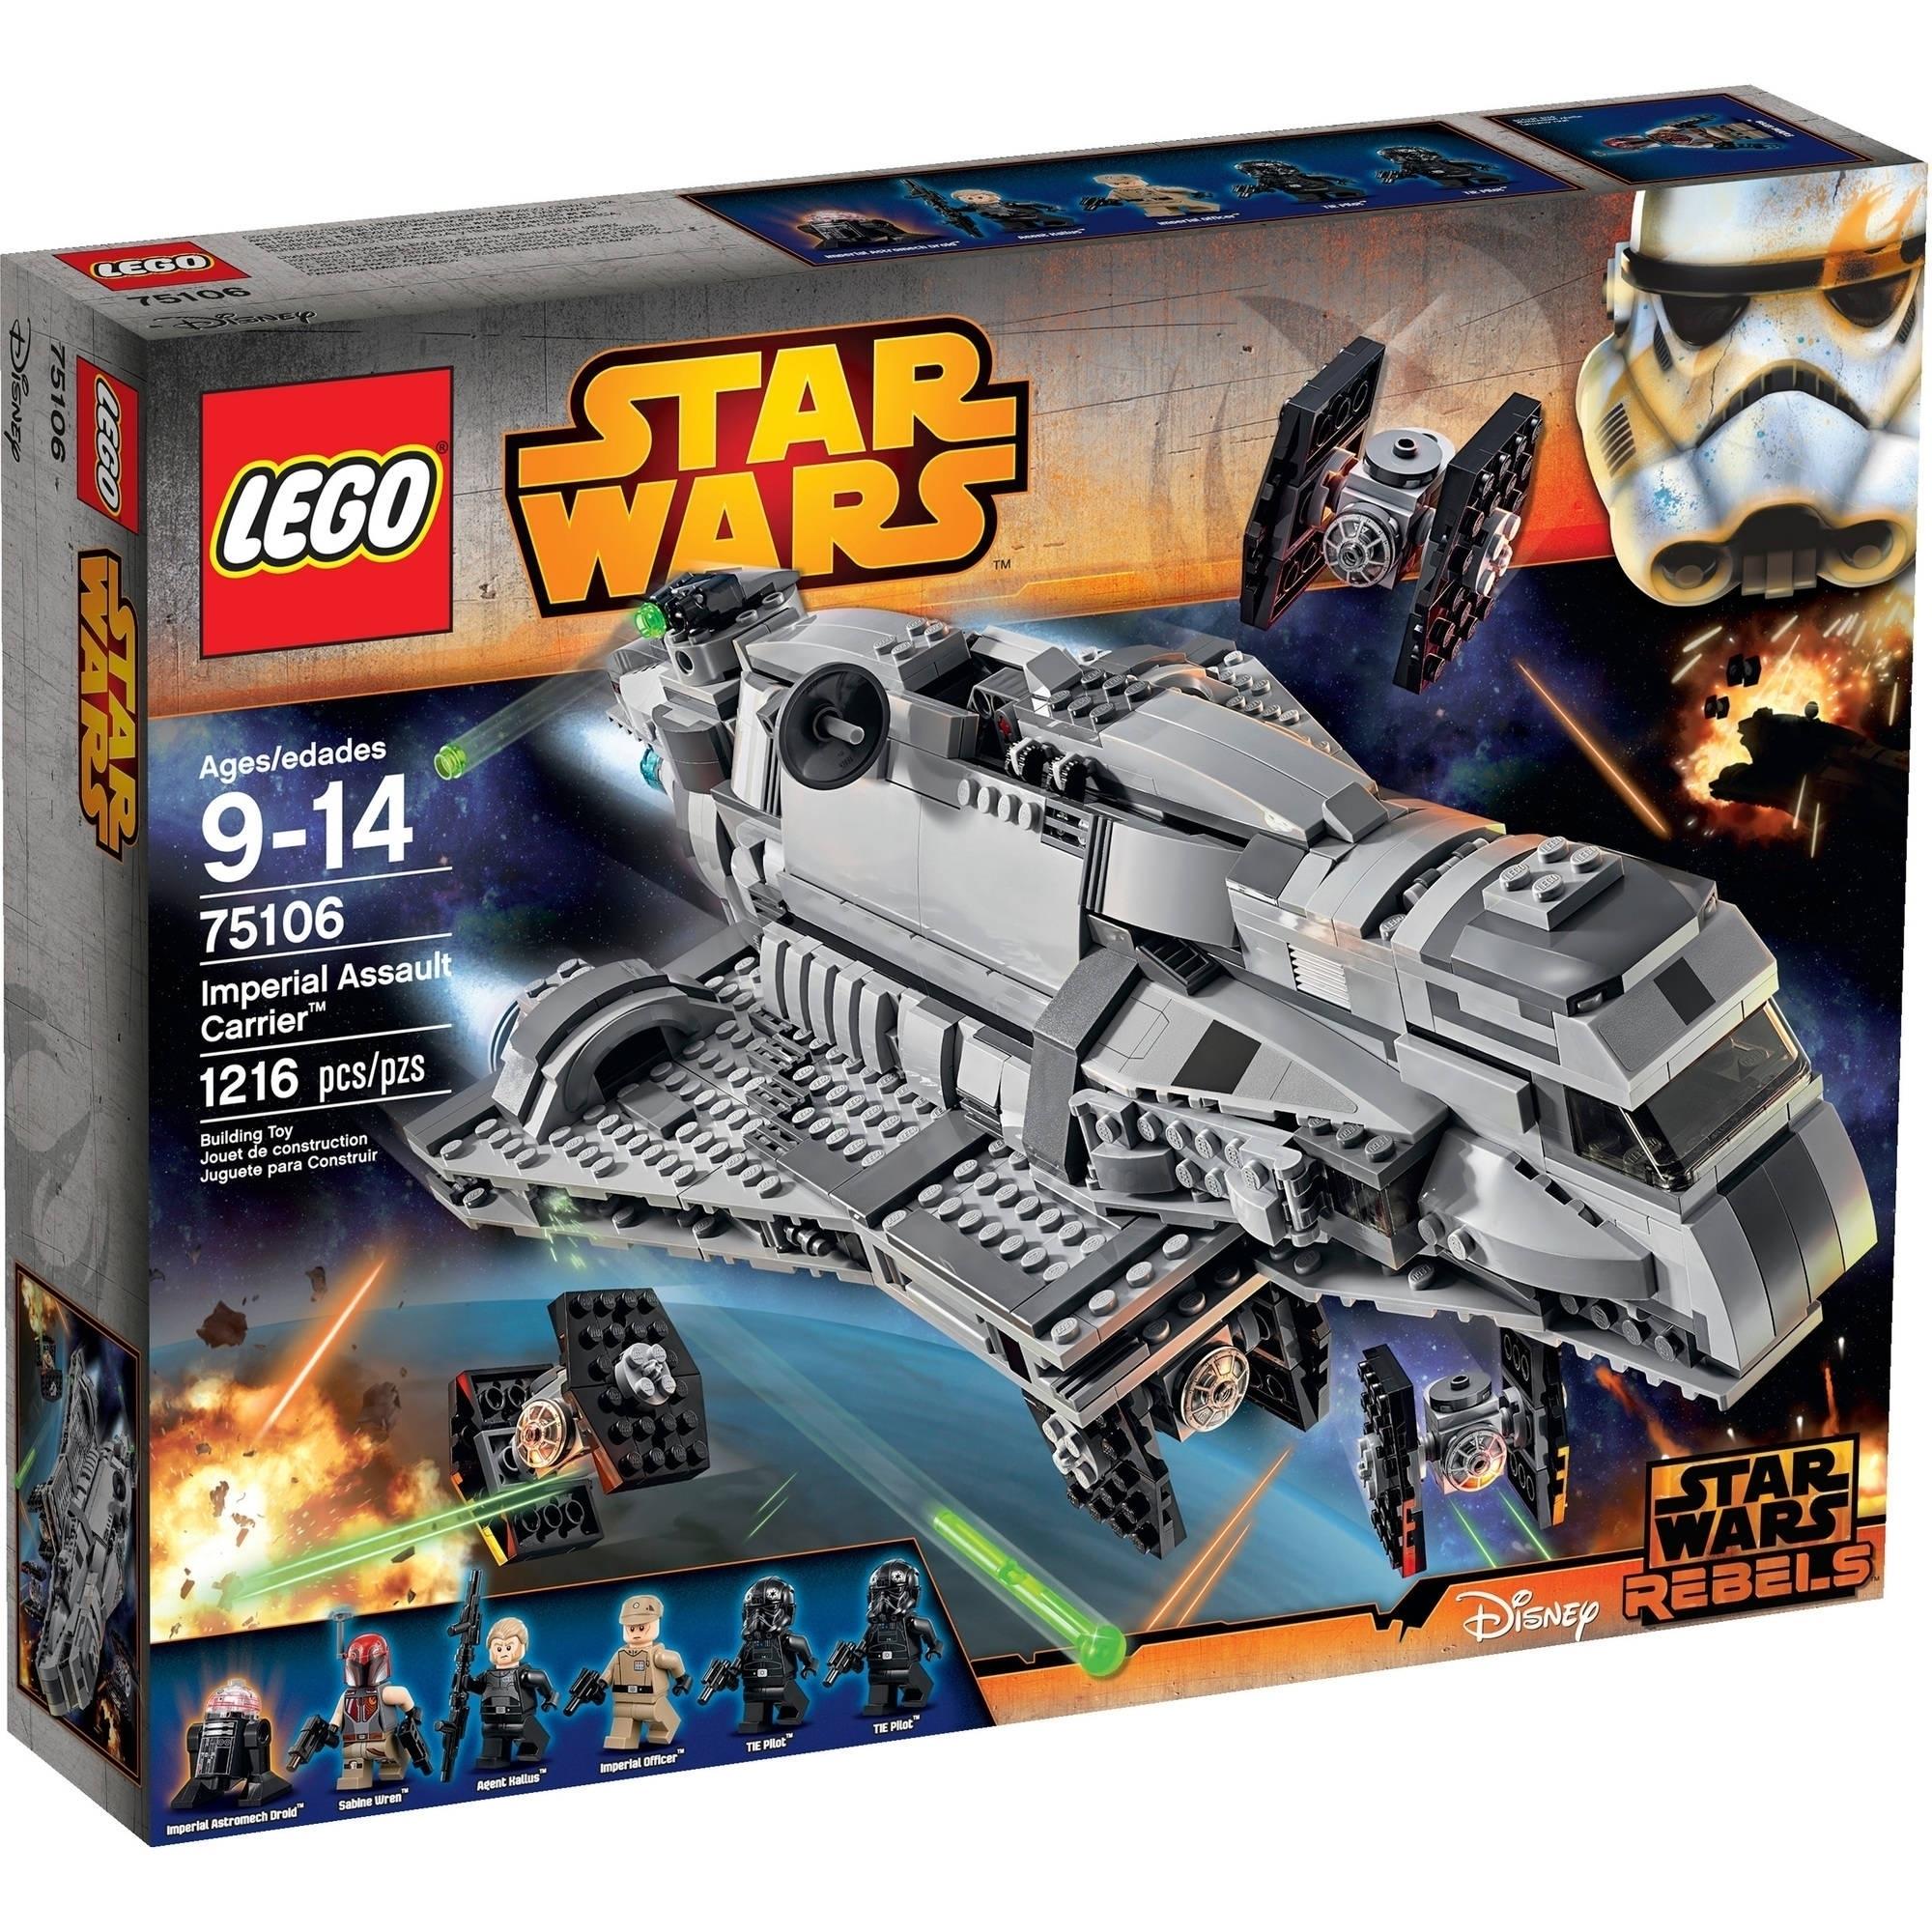 Star Wars Lego Sets Code | Template Calendar Printable with regard to Star Wars Lego Sets Codes